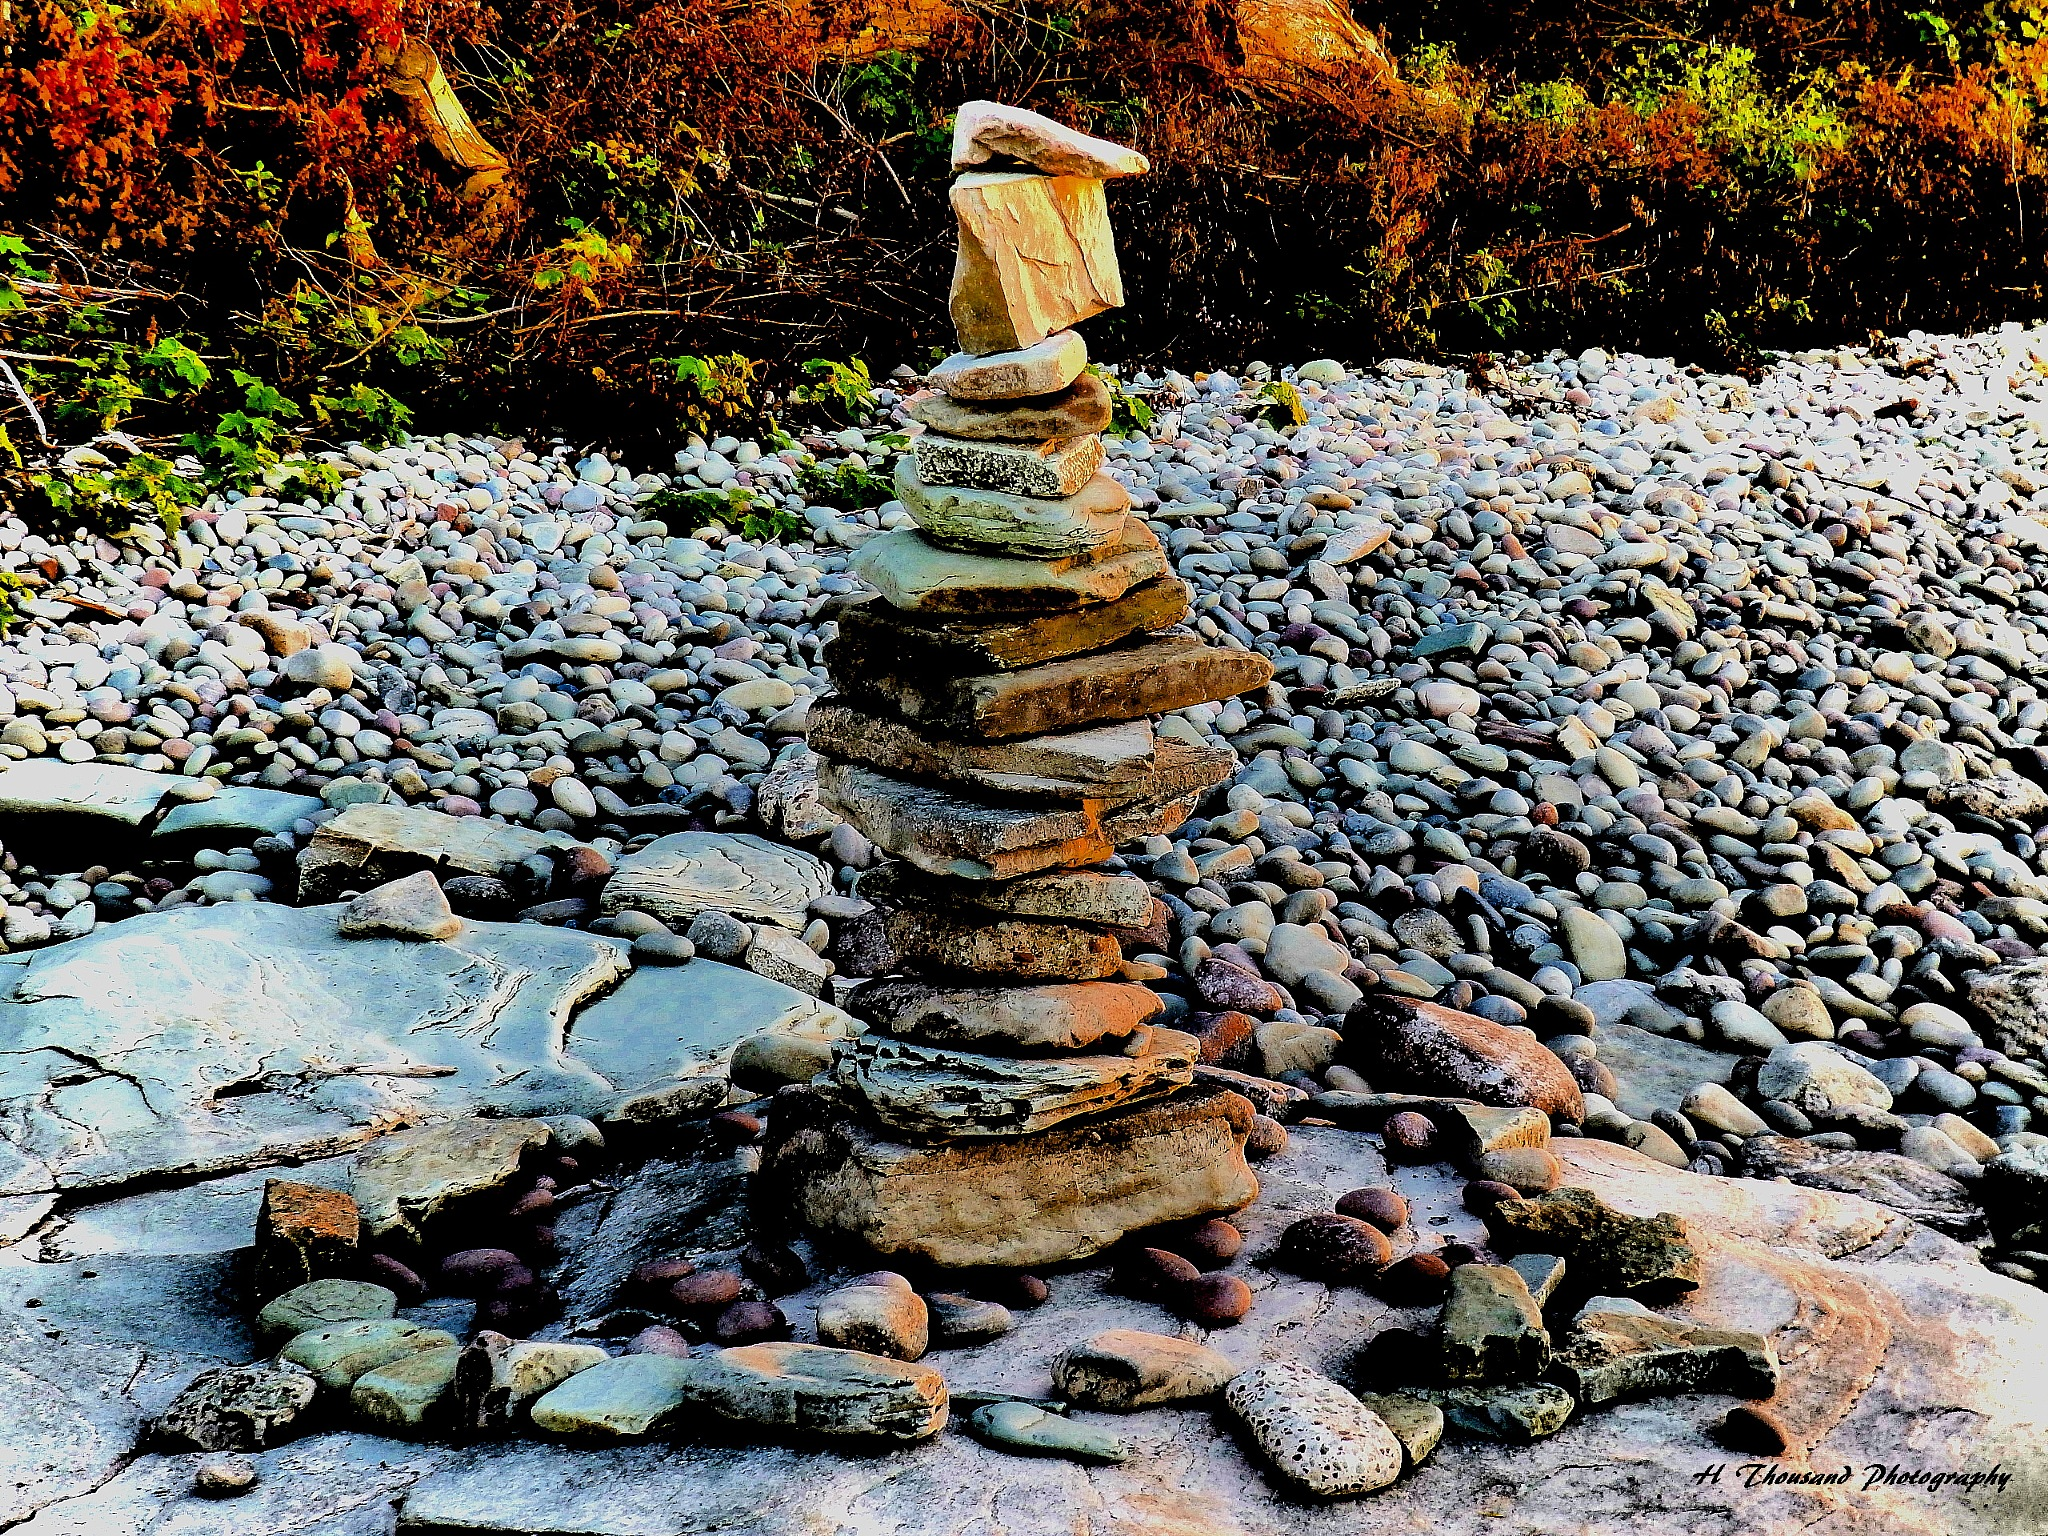 Shoreline Diversity Sculpture by hrthousandjr